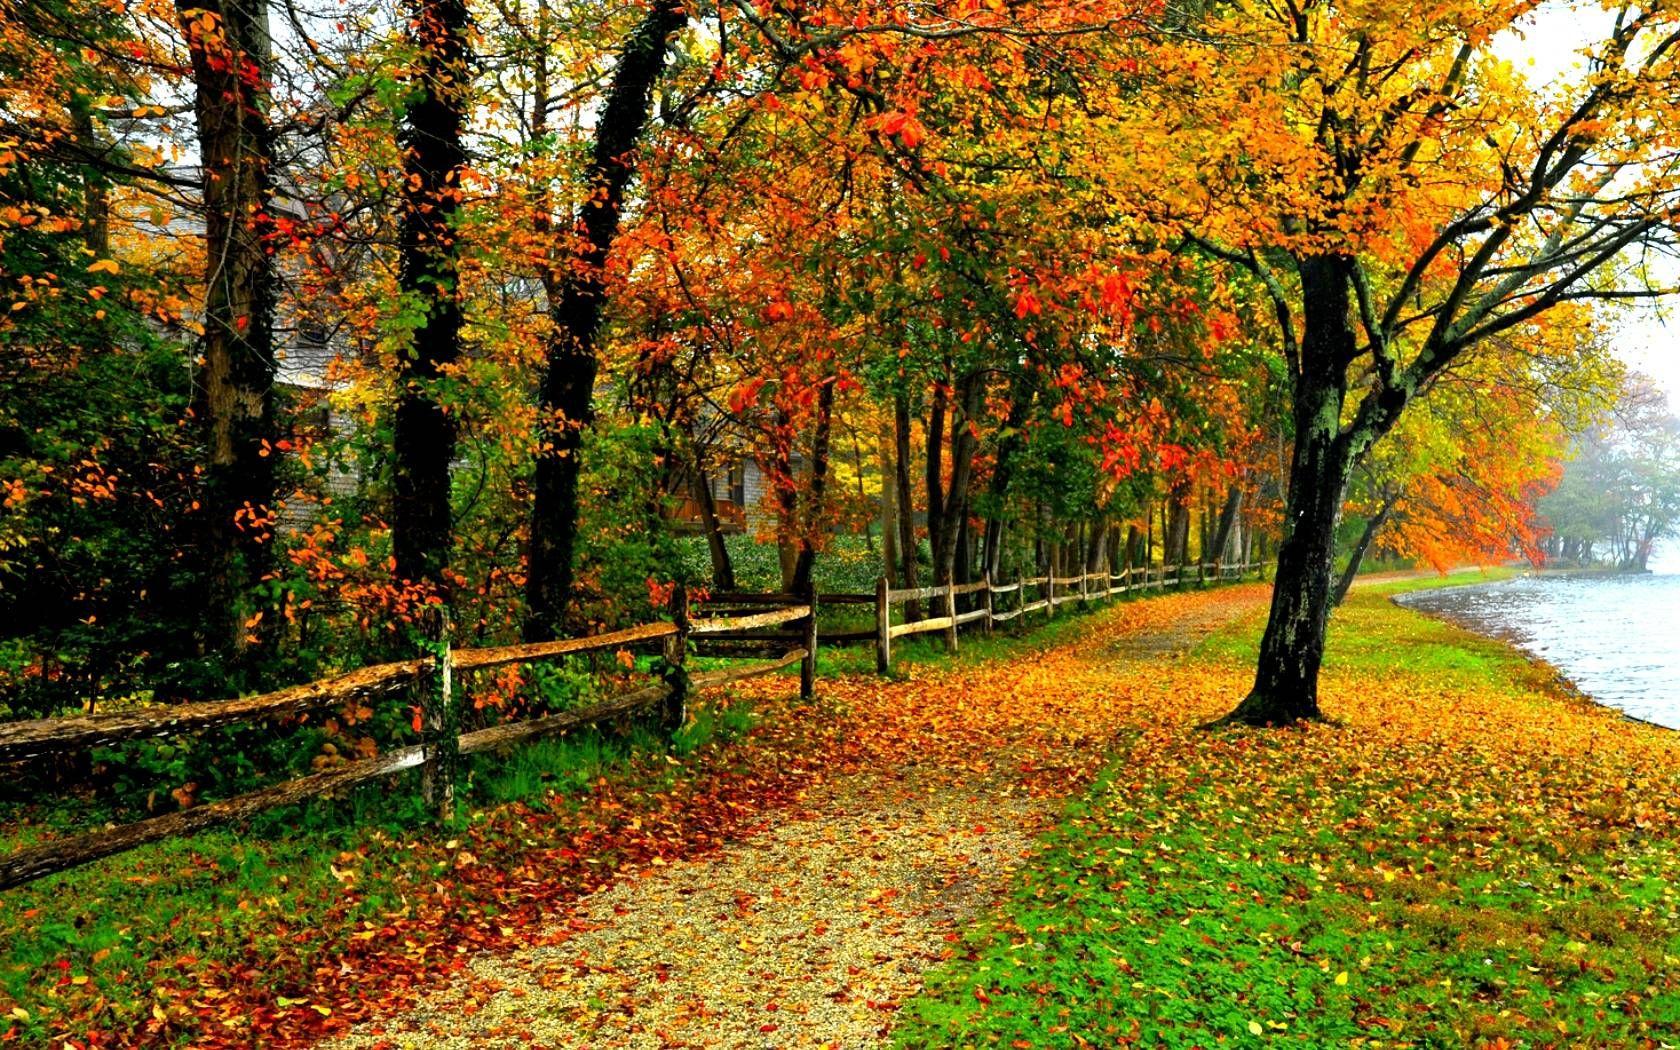 Fall Colors Wallpaper Backgrounds Wallpaper Cave Landscape Background Autumn Landscape Autumn Scenery